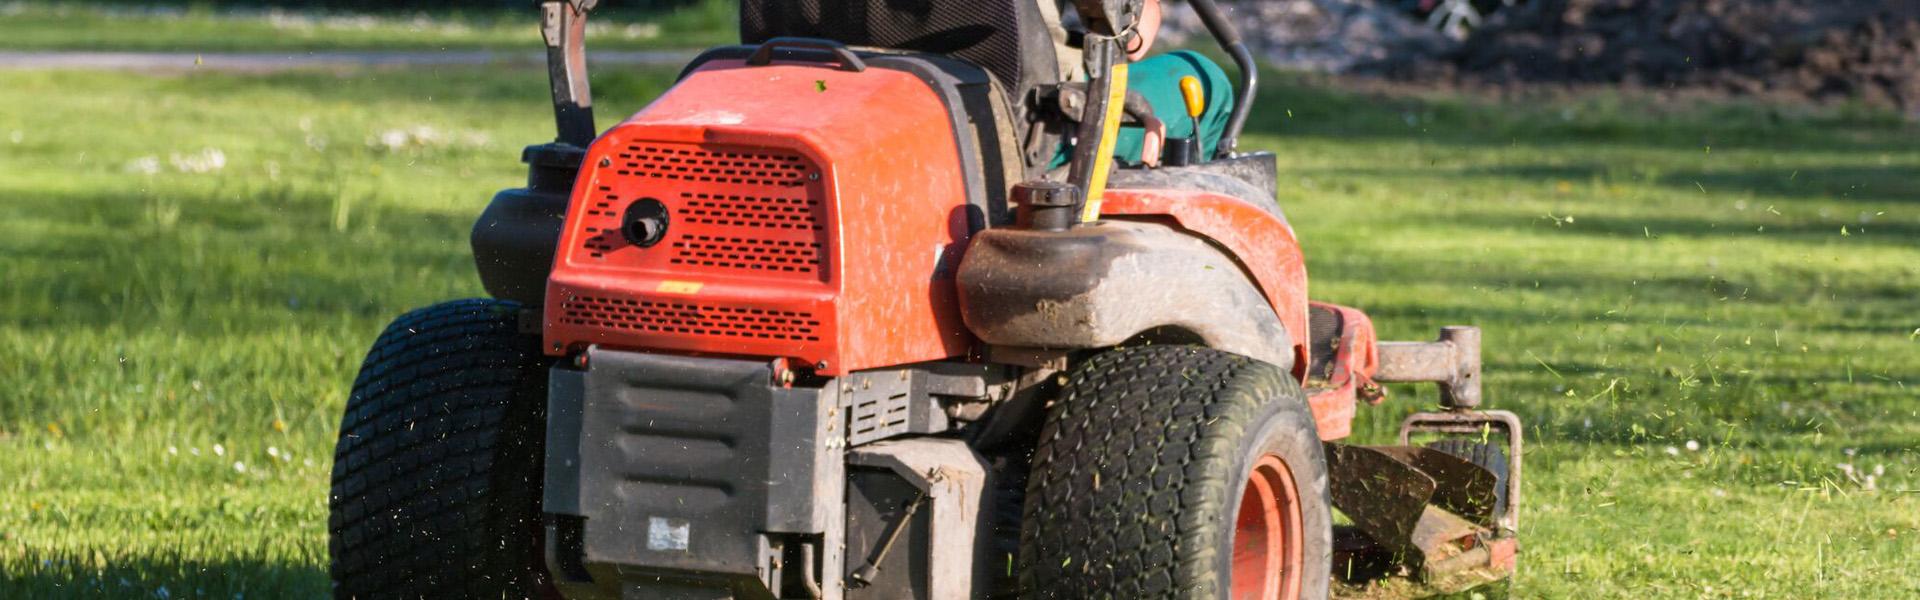 Maintenance and Asset Loss Mitigation